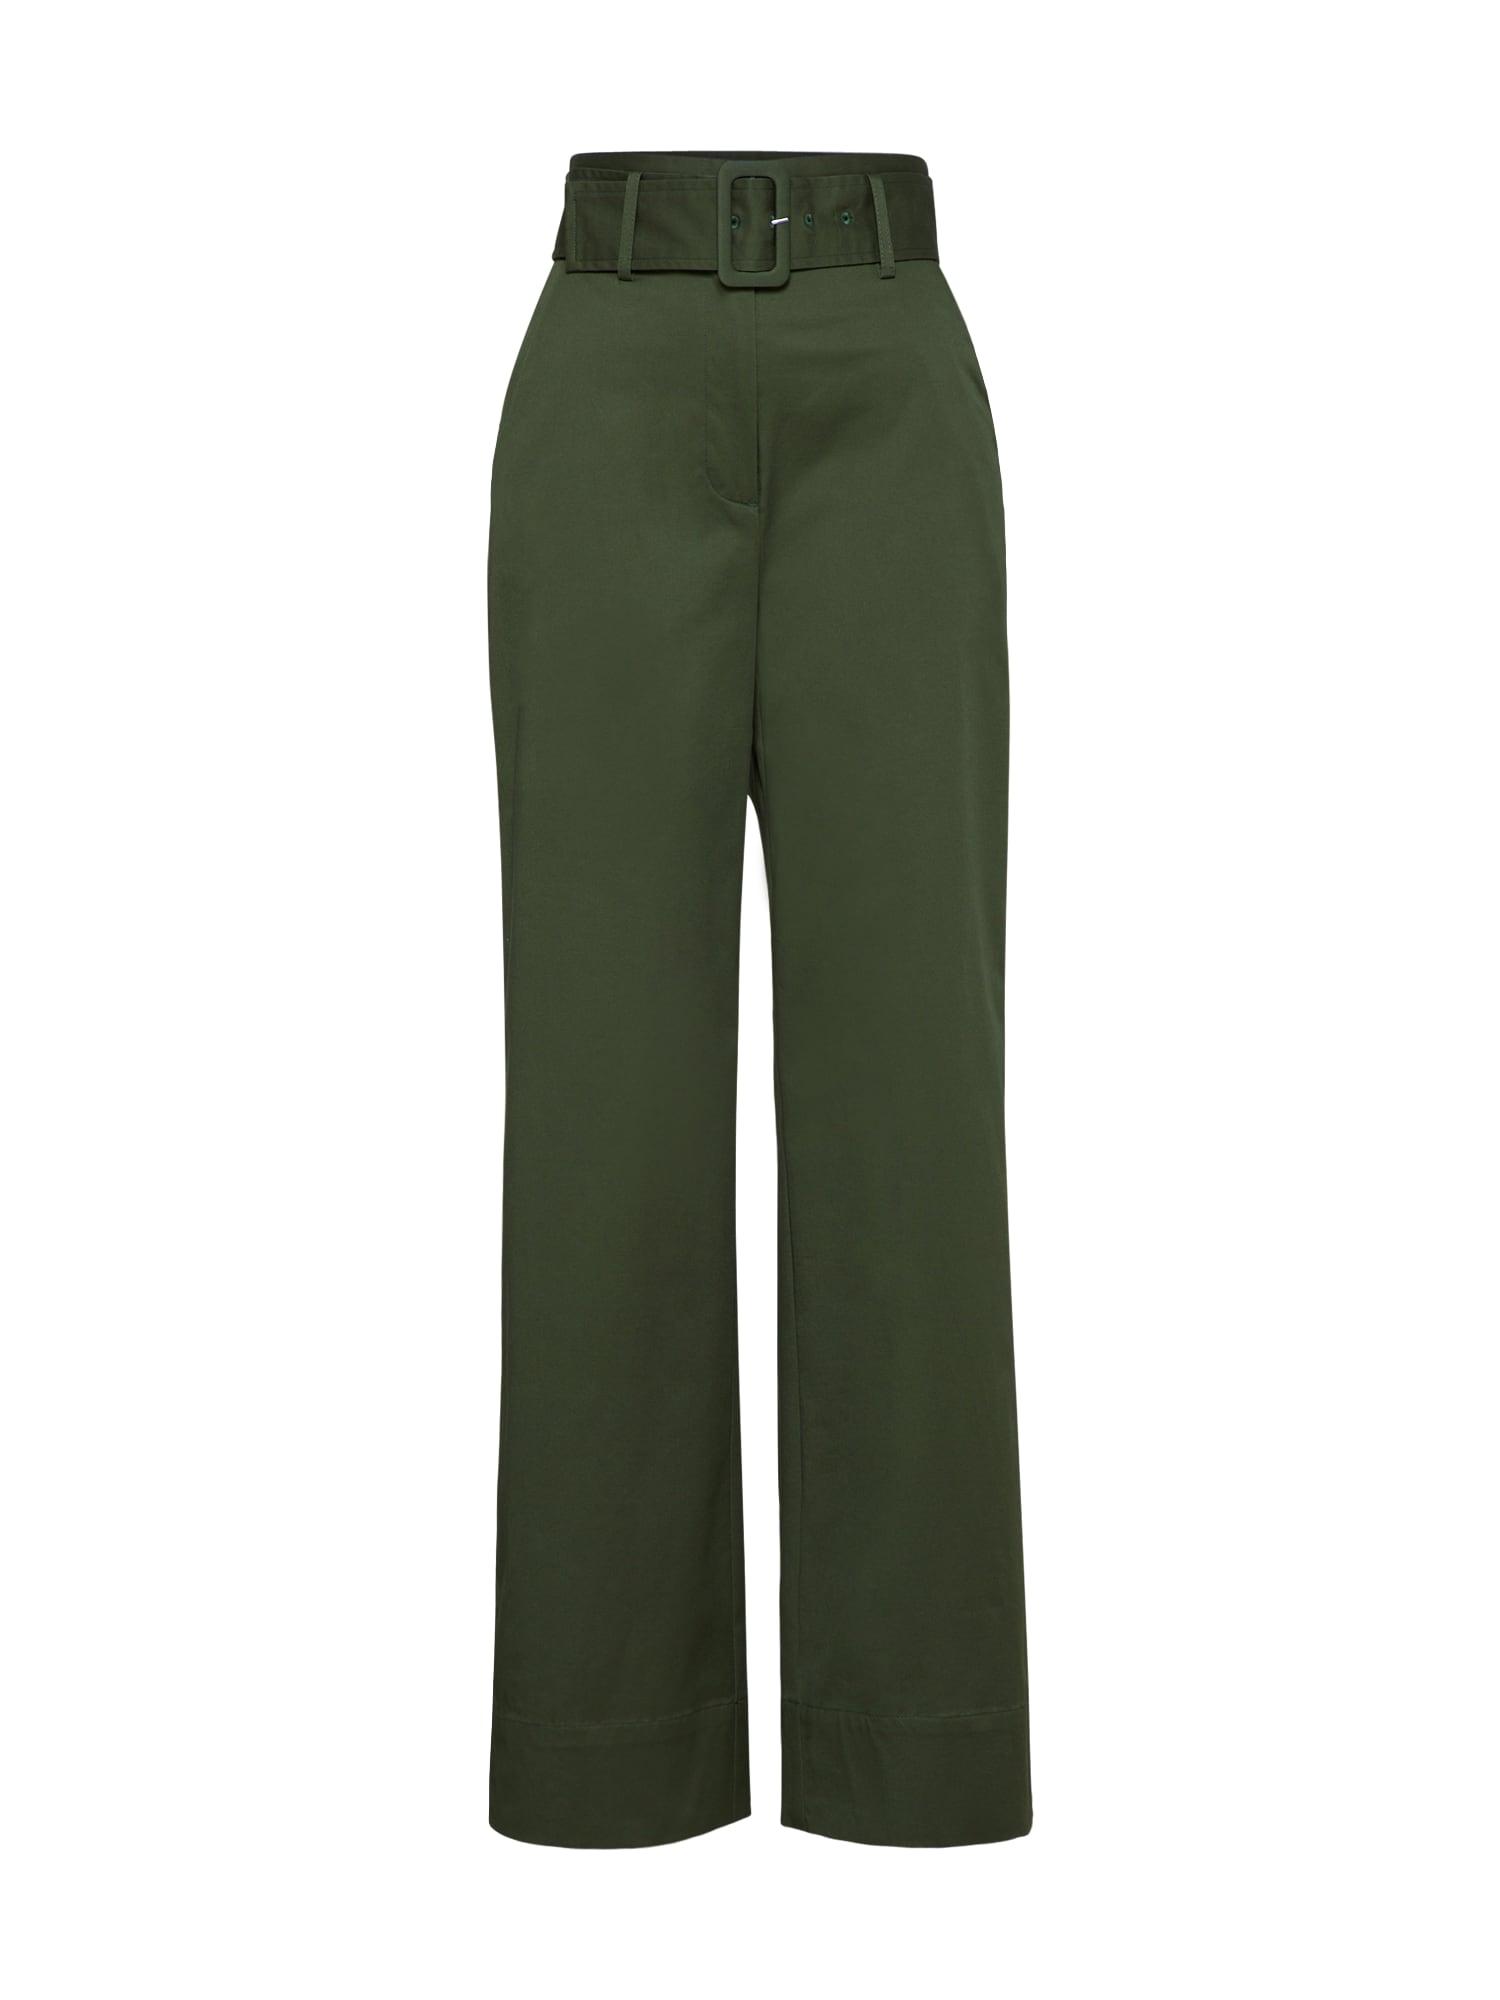 Kalhoty Olena zelená EDITED